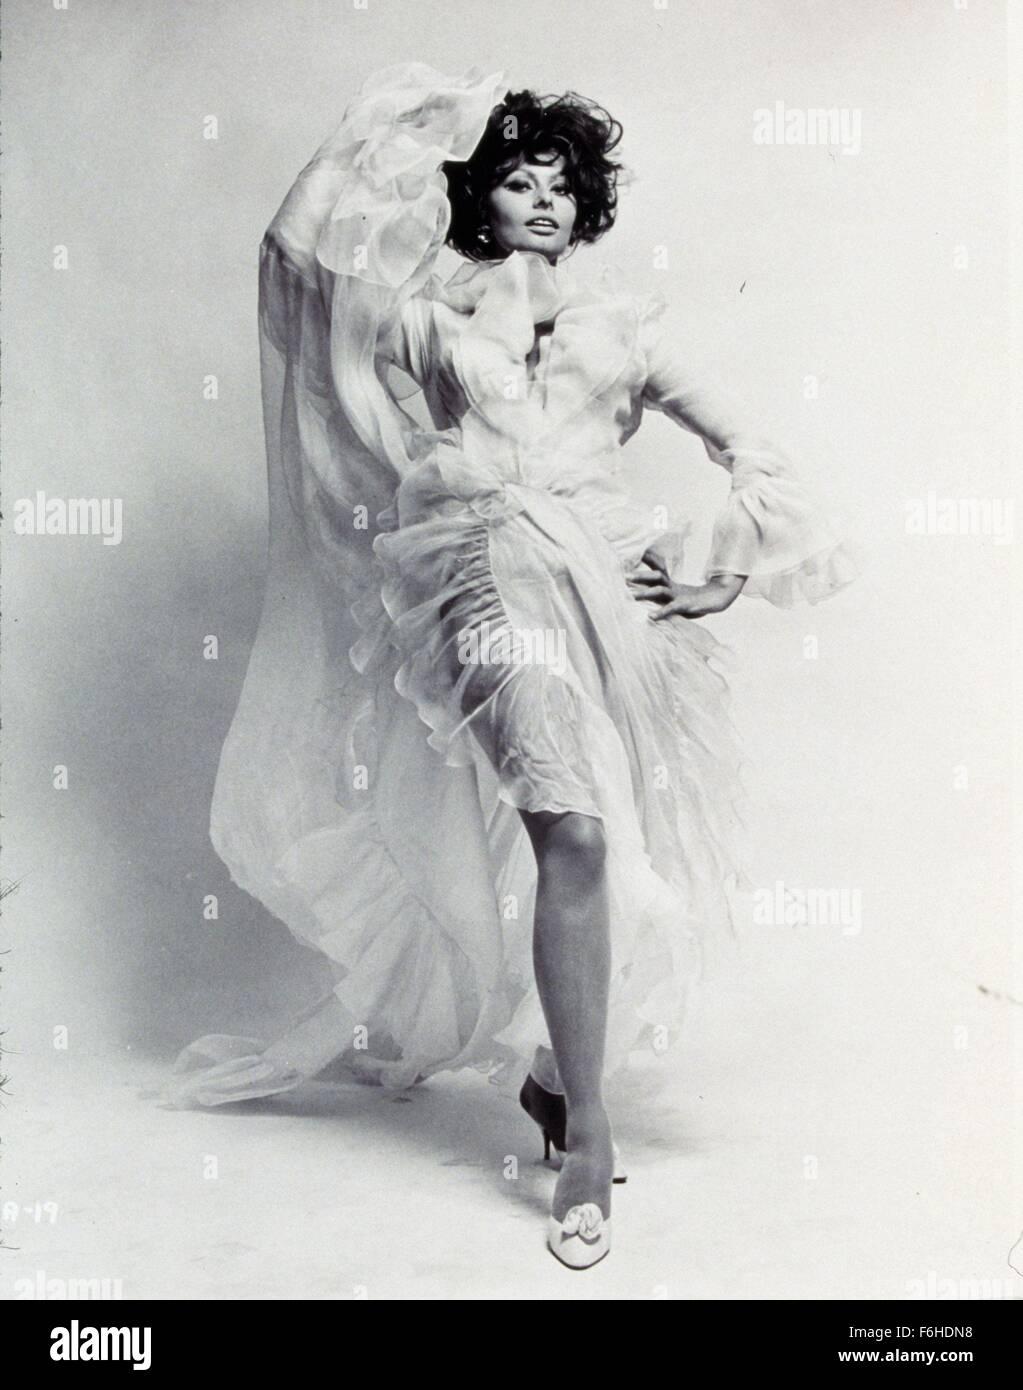 1966, Film Title: ARABESQUE, Director: STANLEY DONEN, Studio: UNIV, Pictured: STANLEY DONEN. (Credit Image: SNAP) - Stock Image